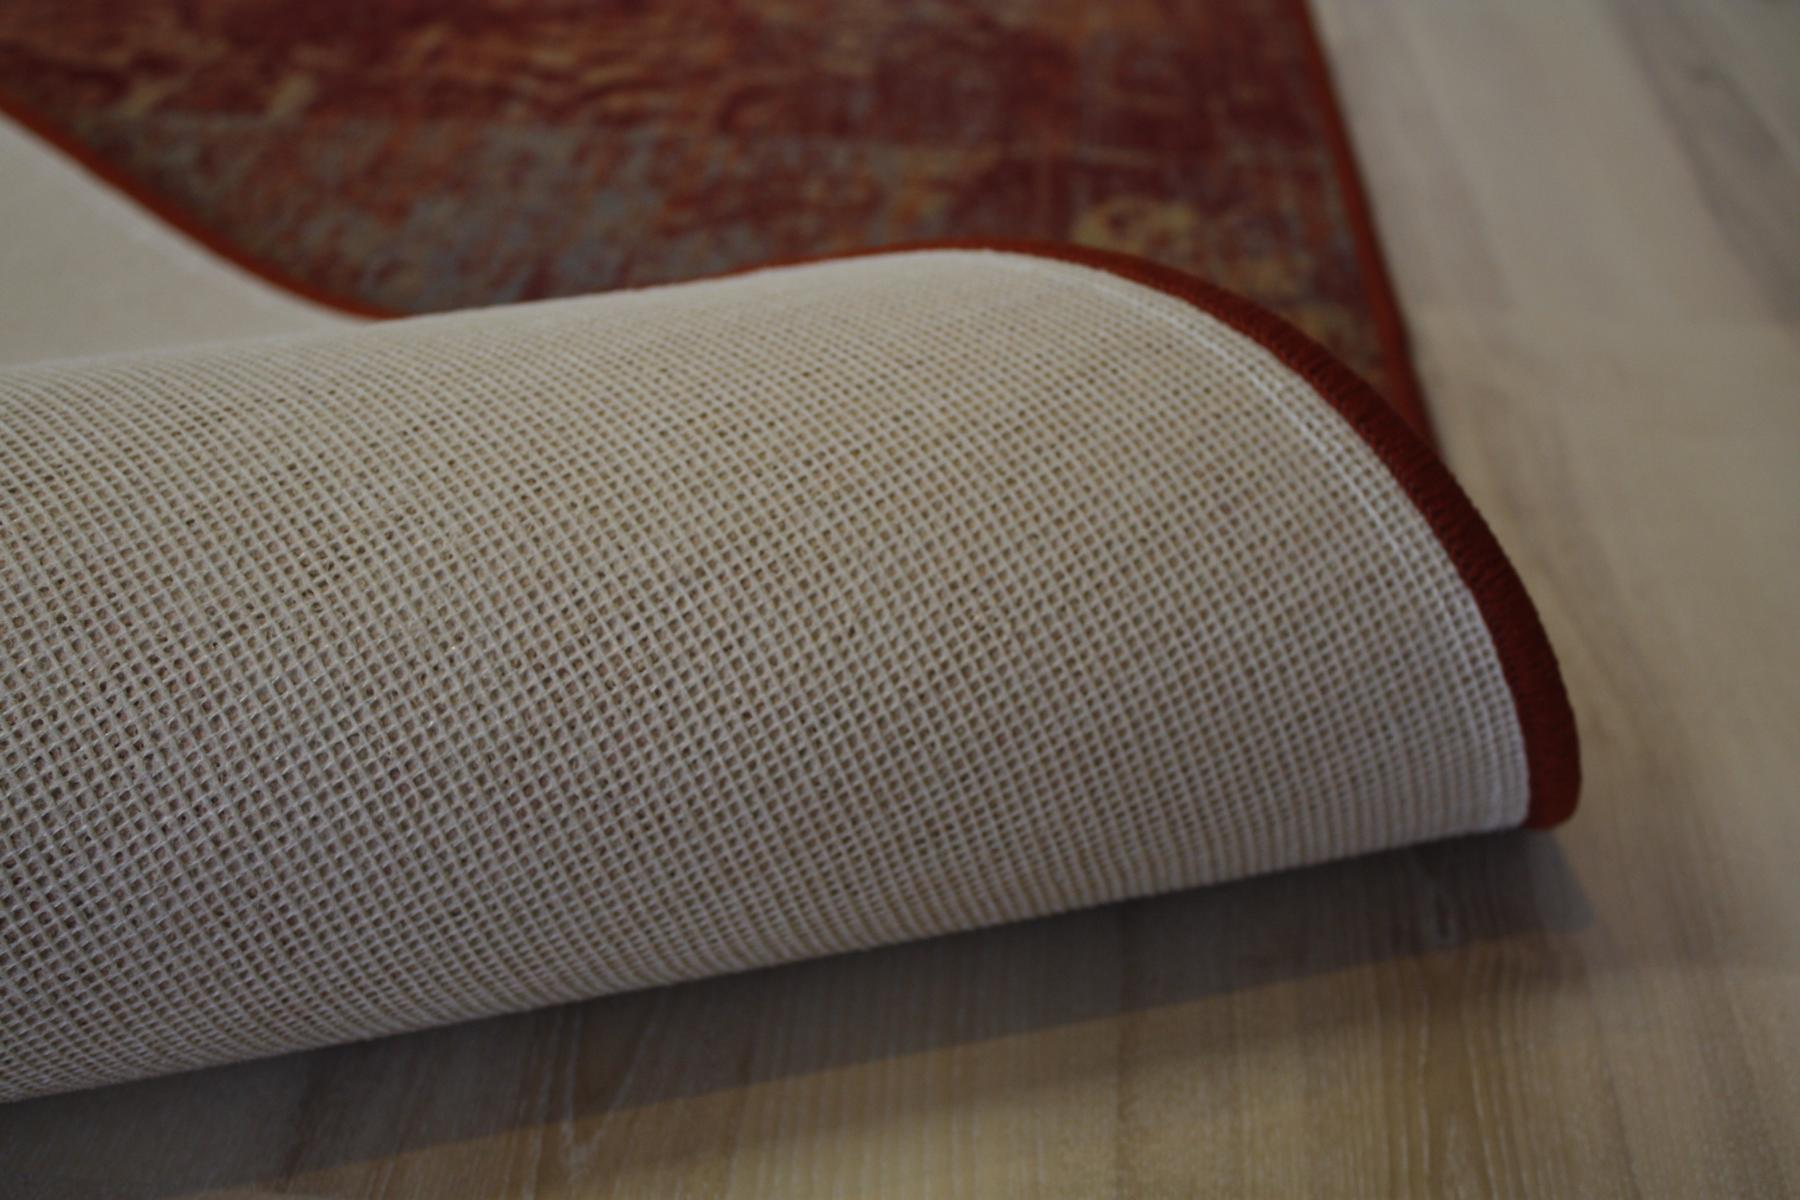 Tappeto patchwork pavimento tappeto rosso 200x400 cm ebay - Tappeto riscaldamento pavimento ...